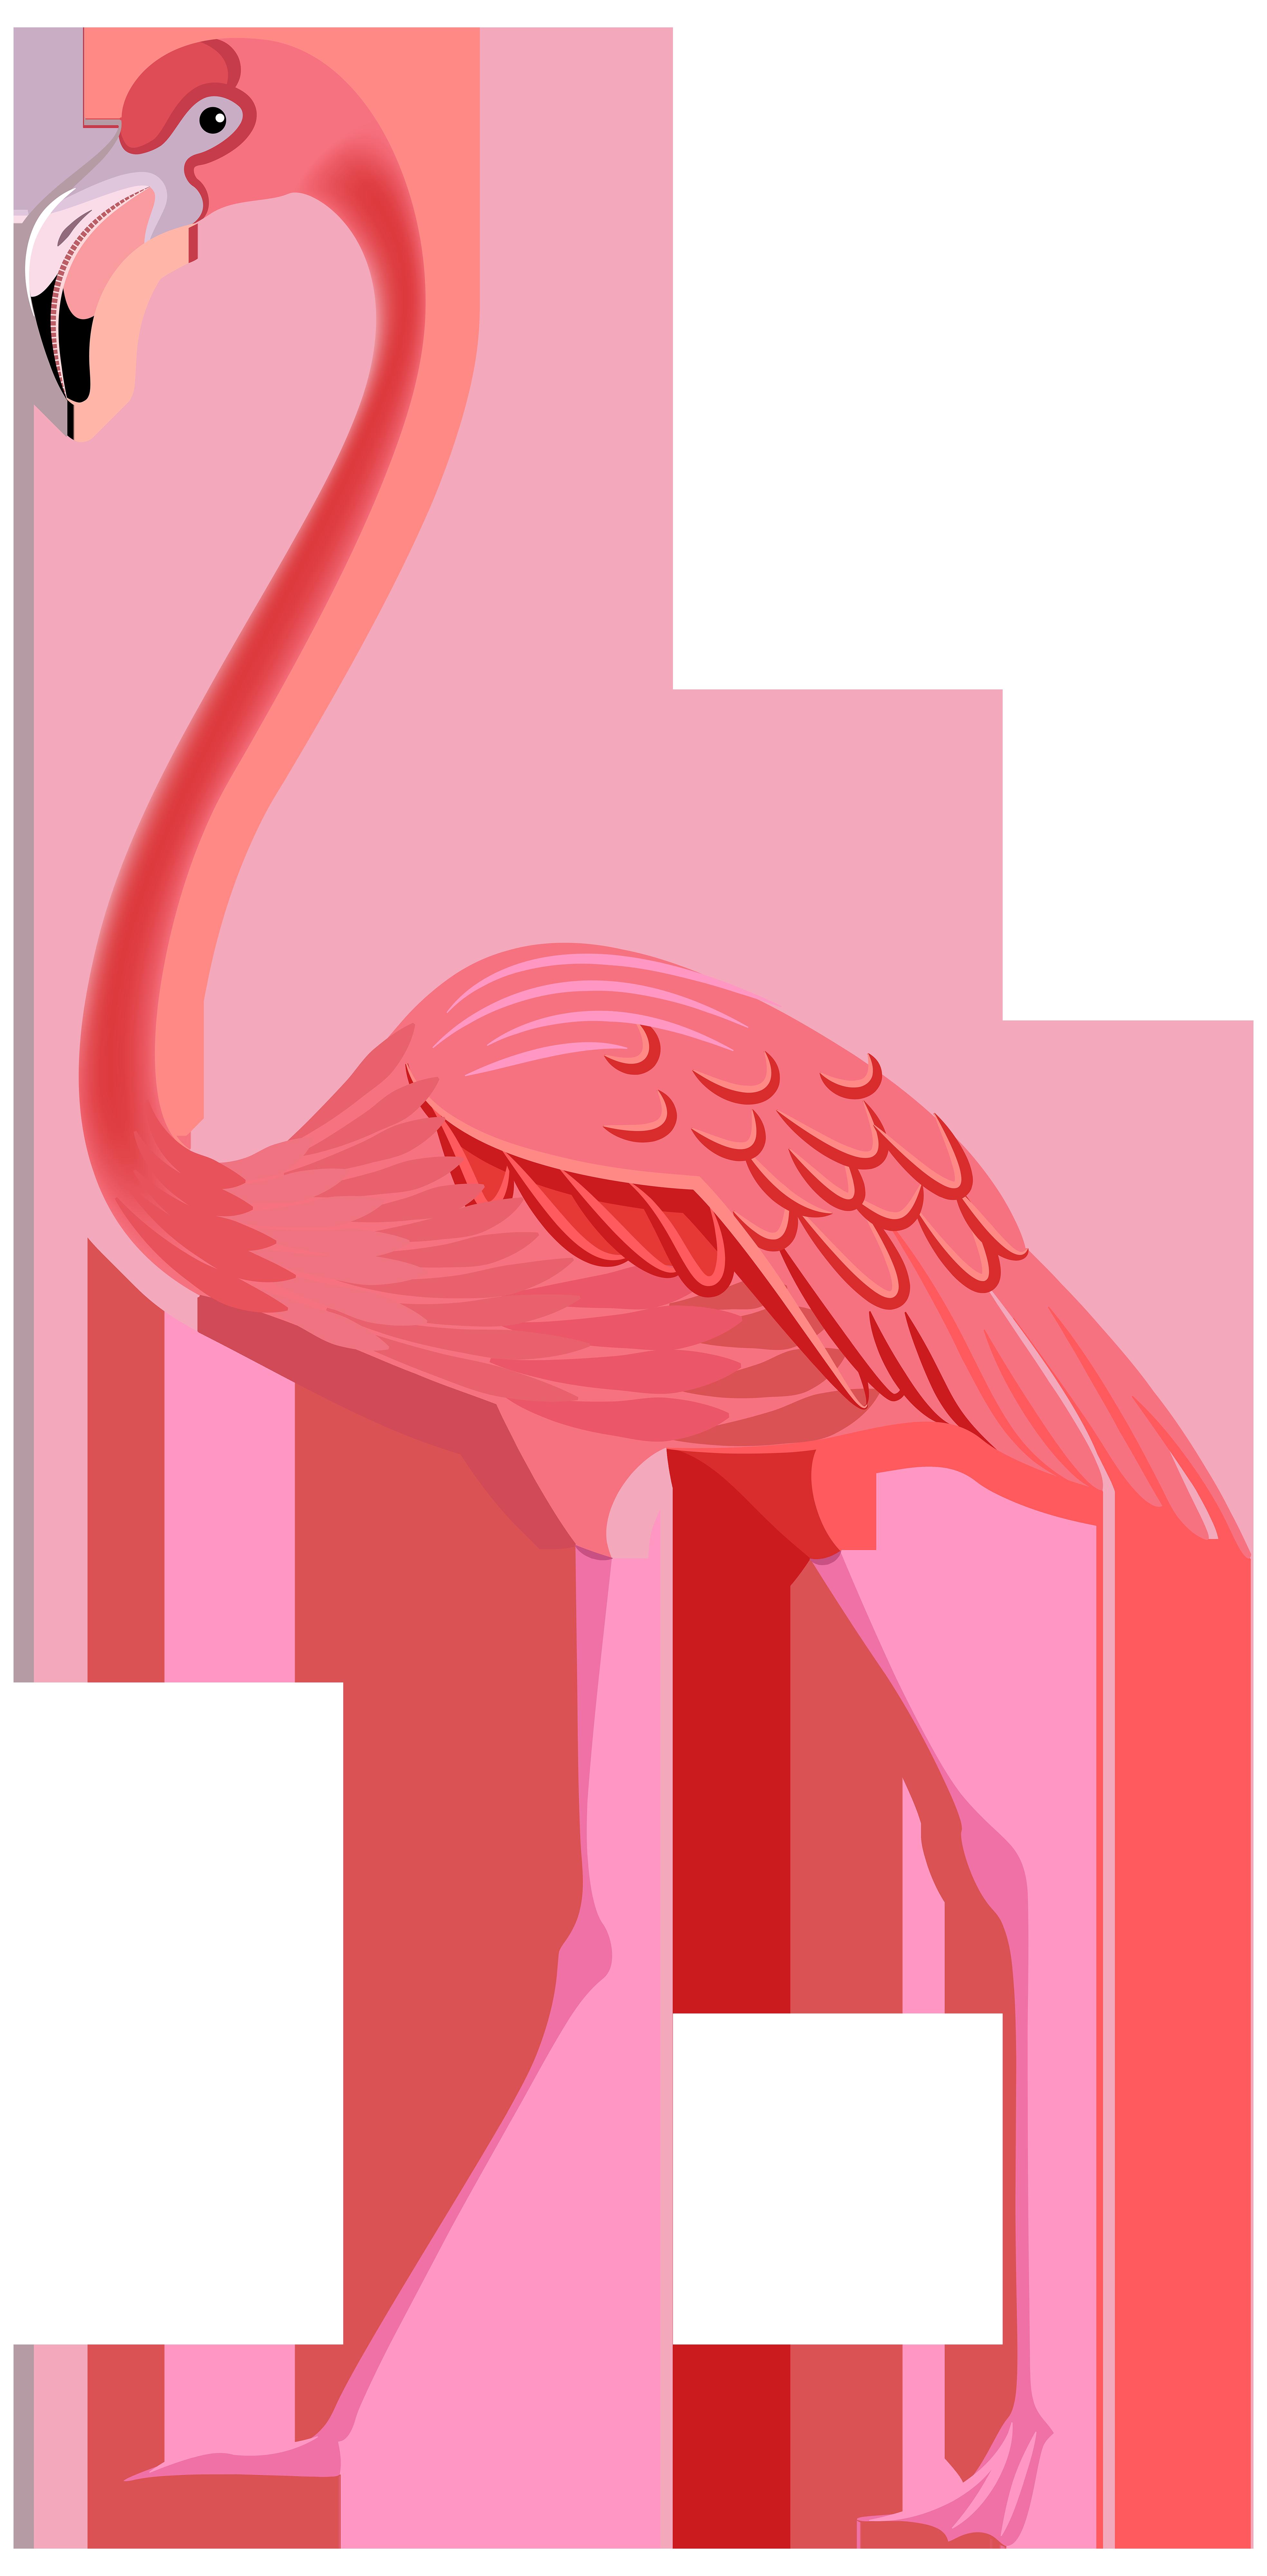 Flamingo clipart #1, Download drawings